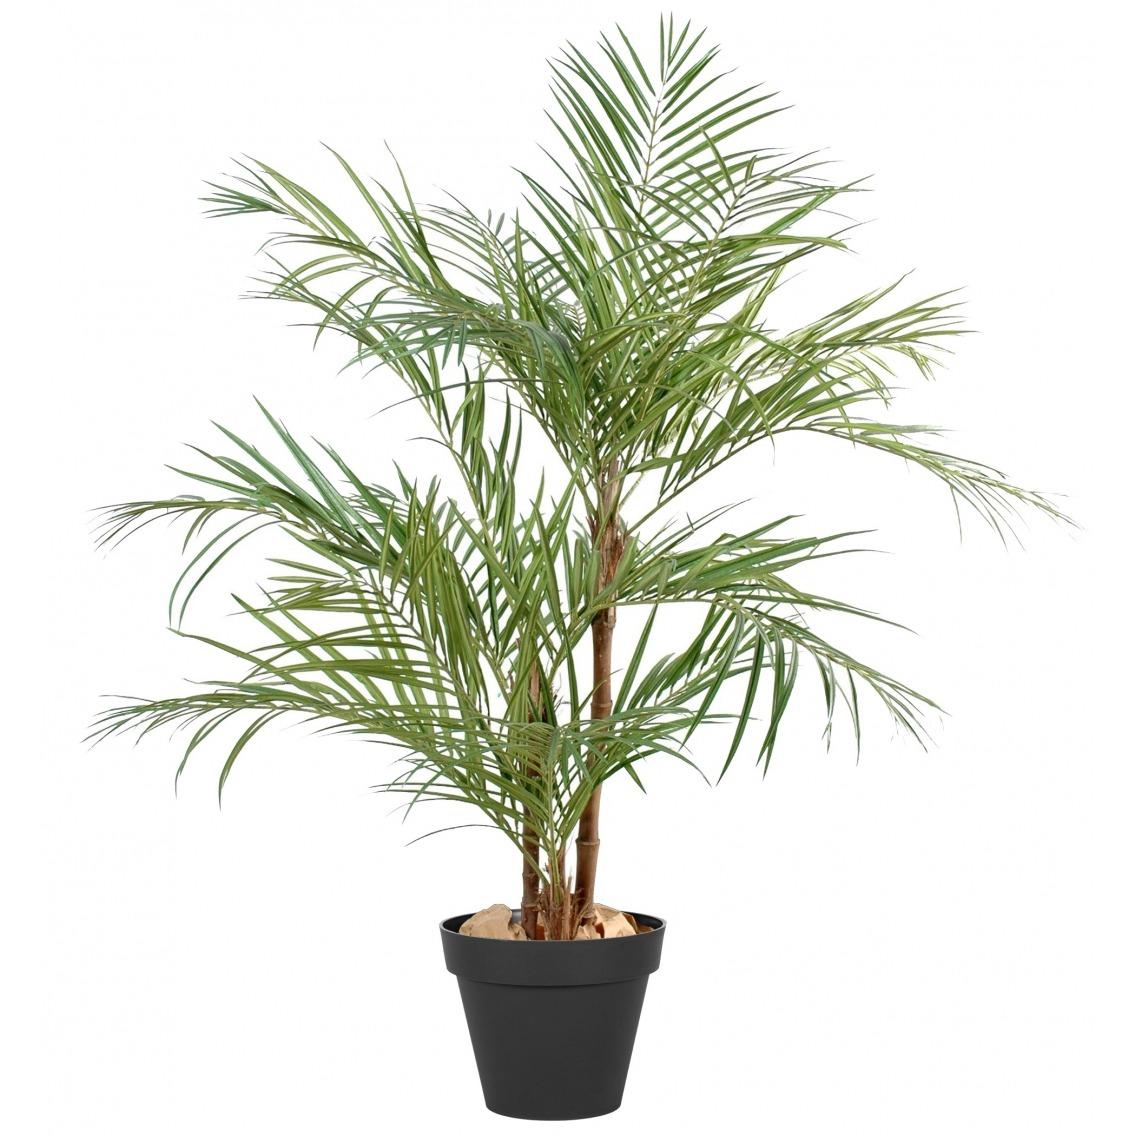 Grand palmier areca